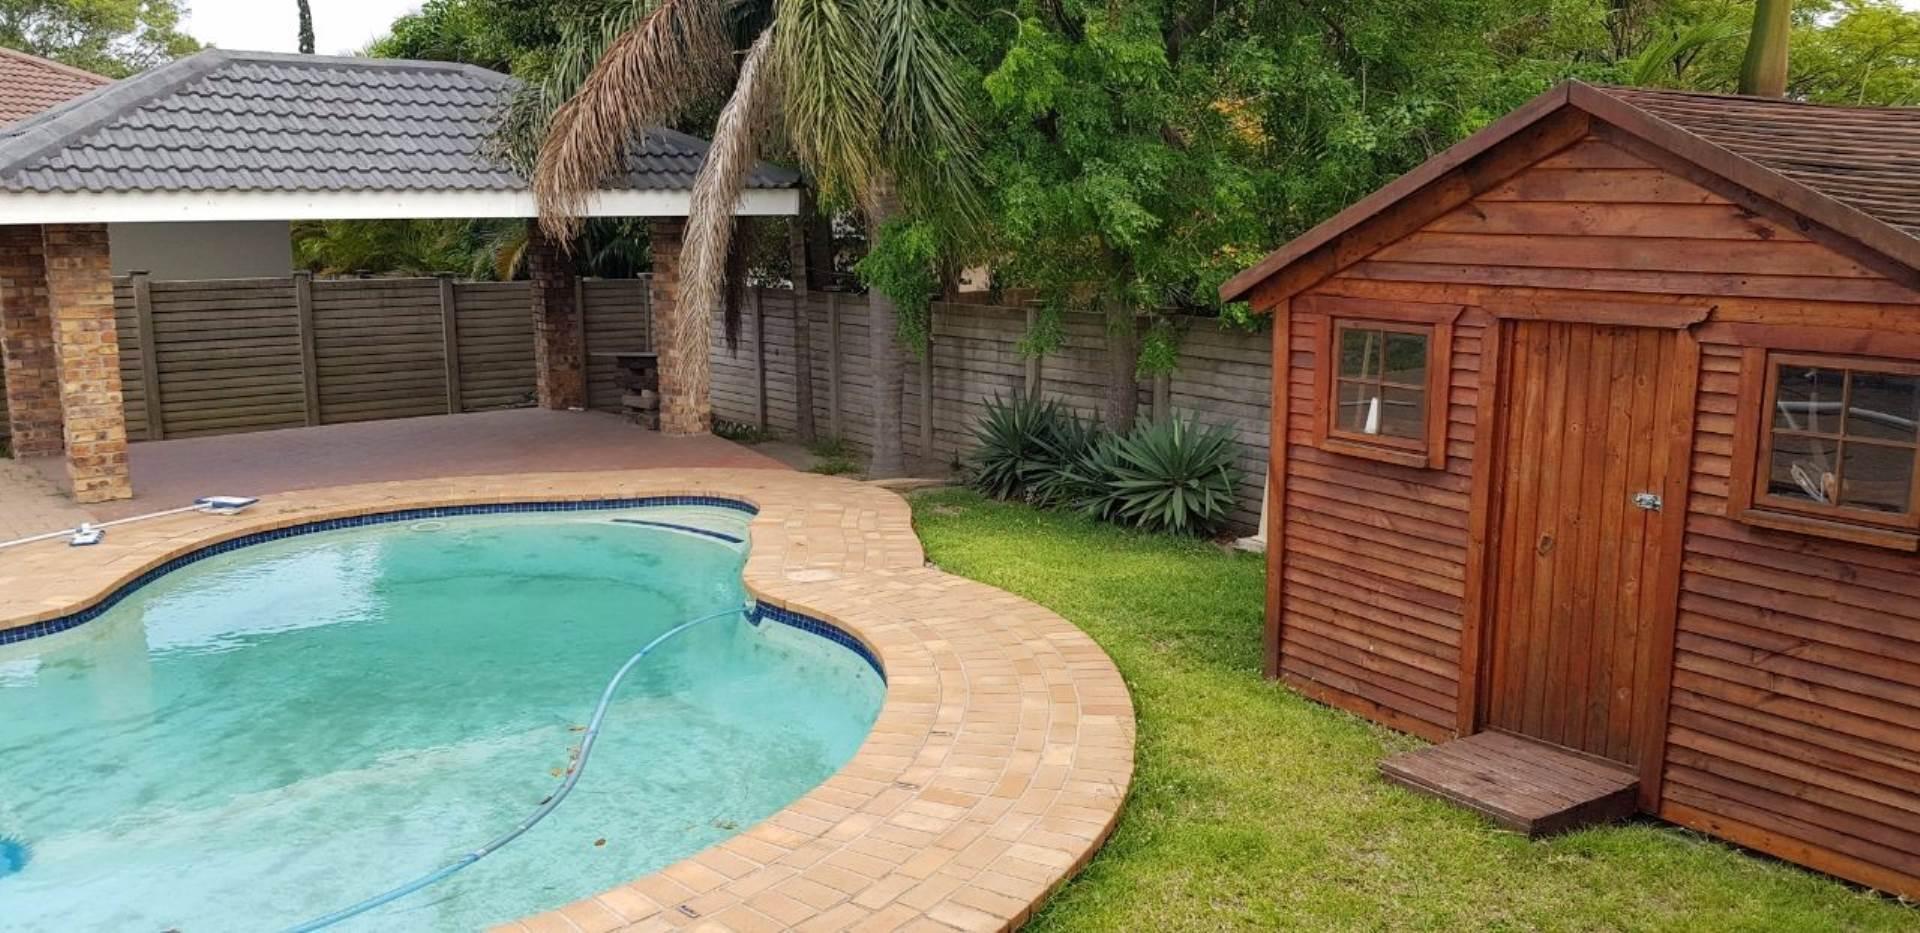 4 BedroomHouse For Sale In Birdswood